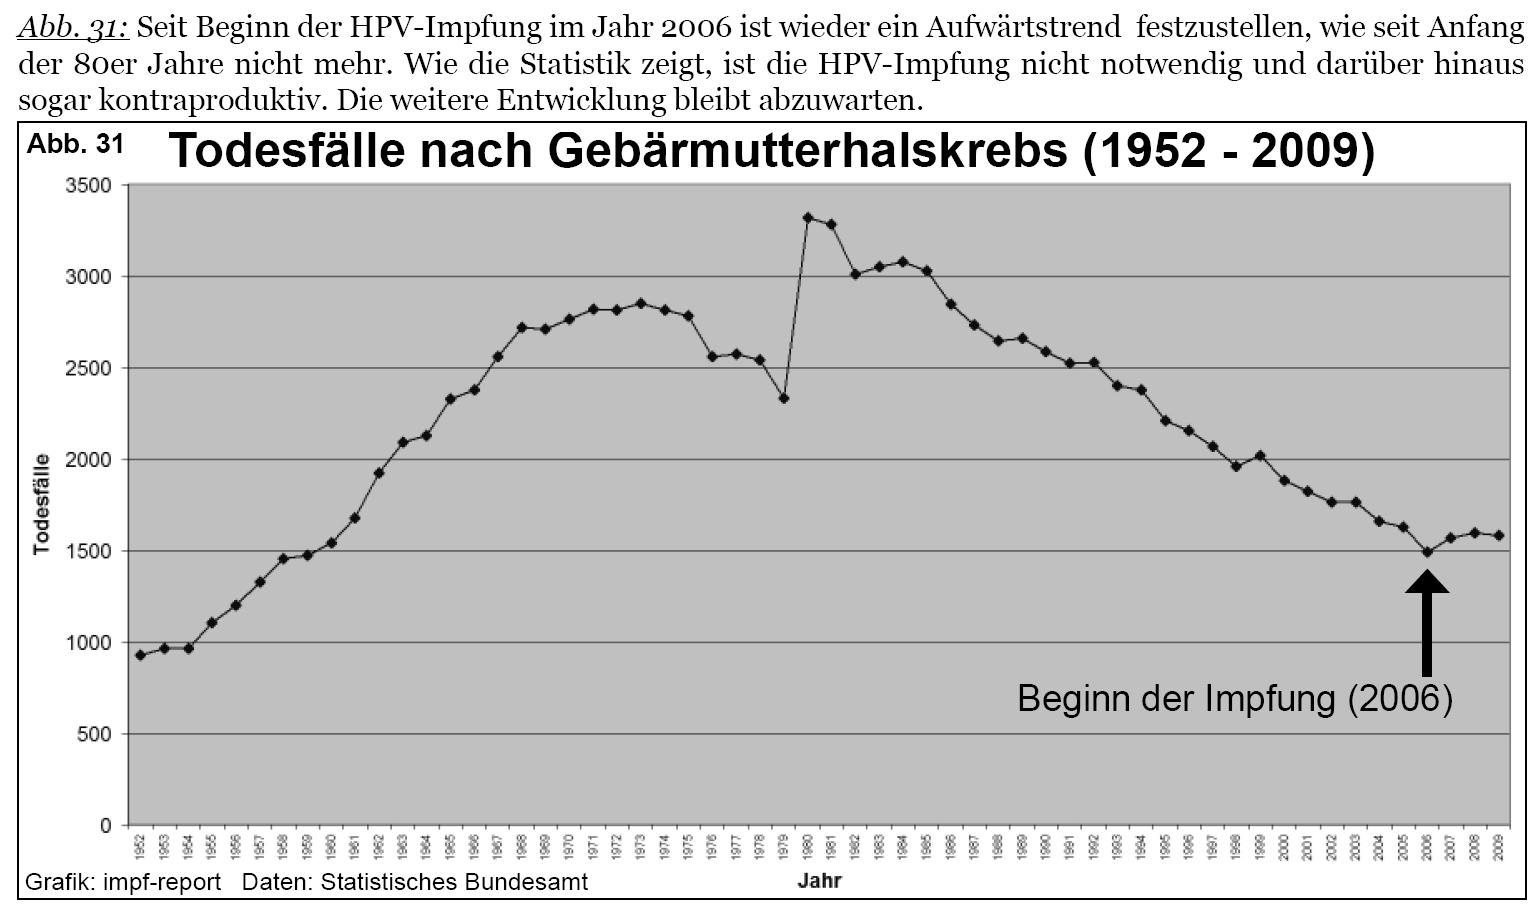 hpv impfung luxemburg